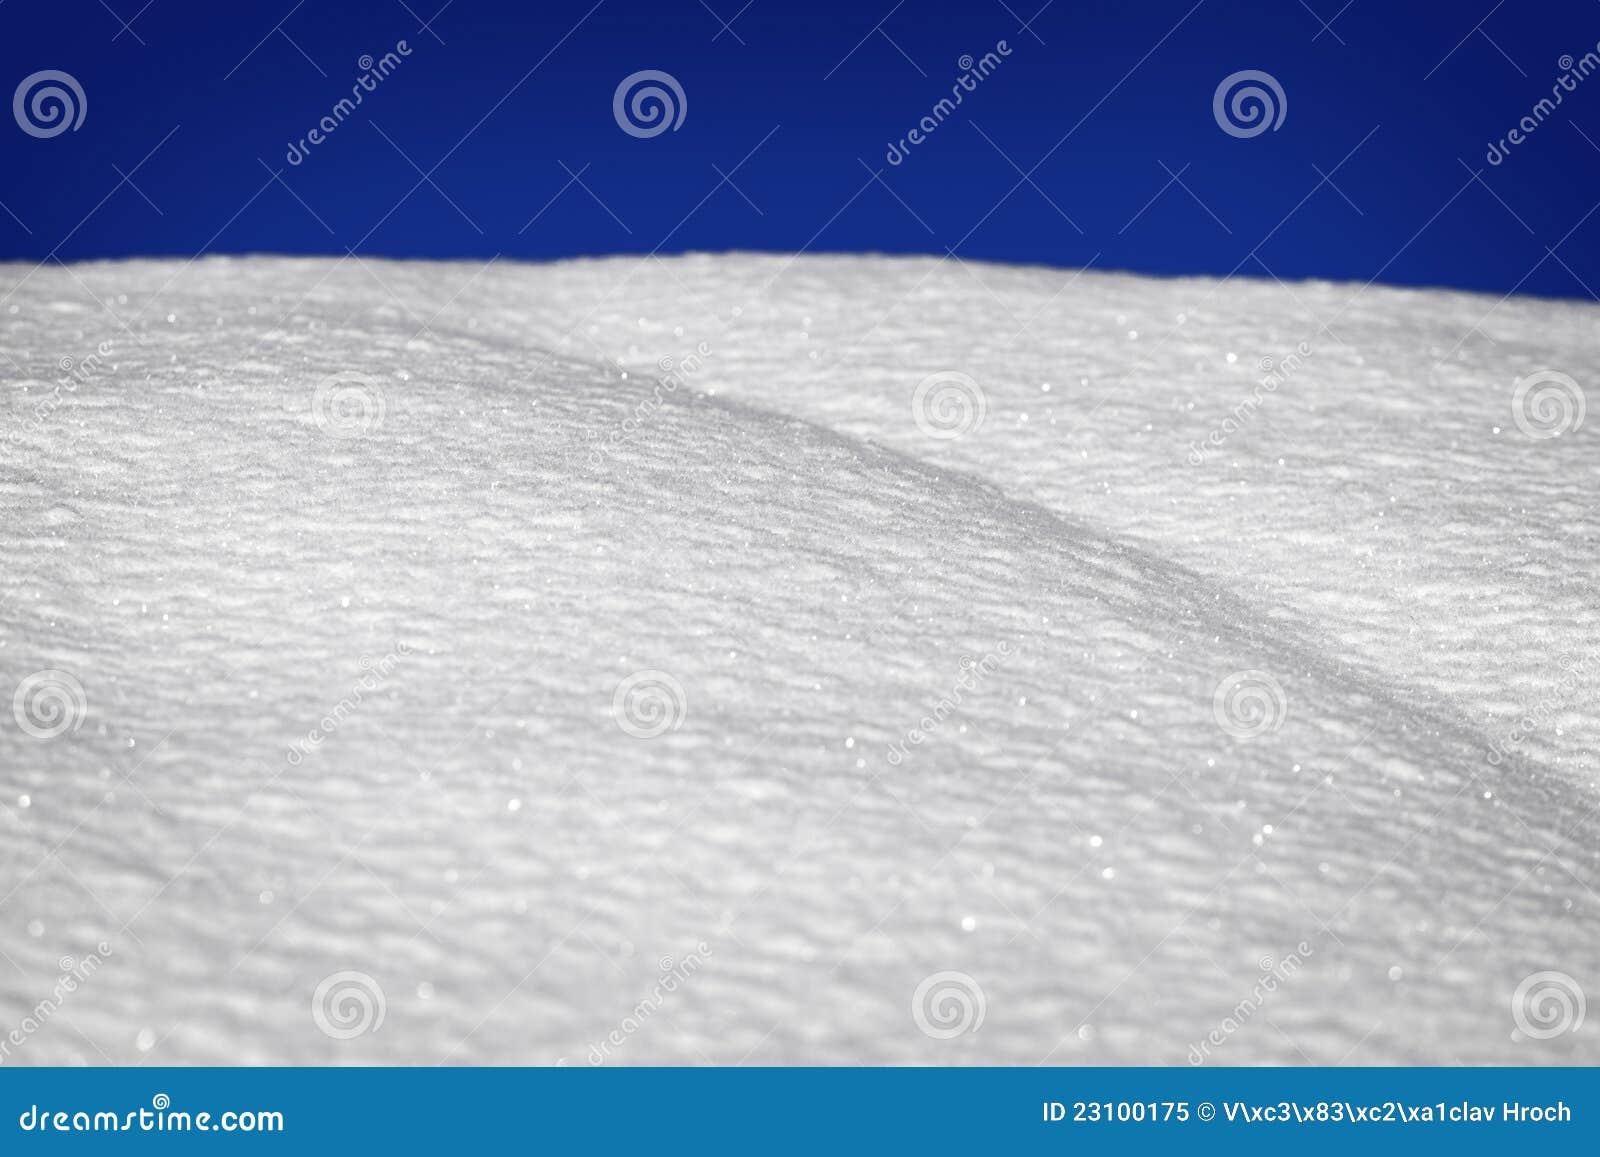 Текстура снежка с горизонтом